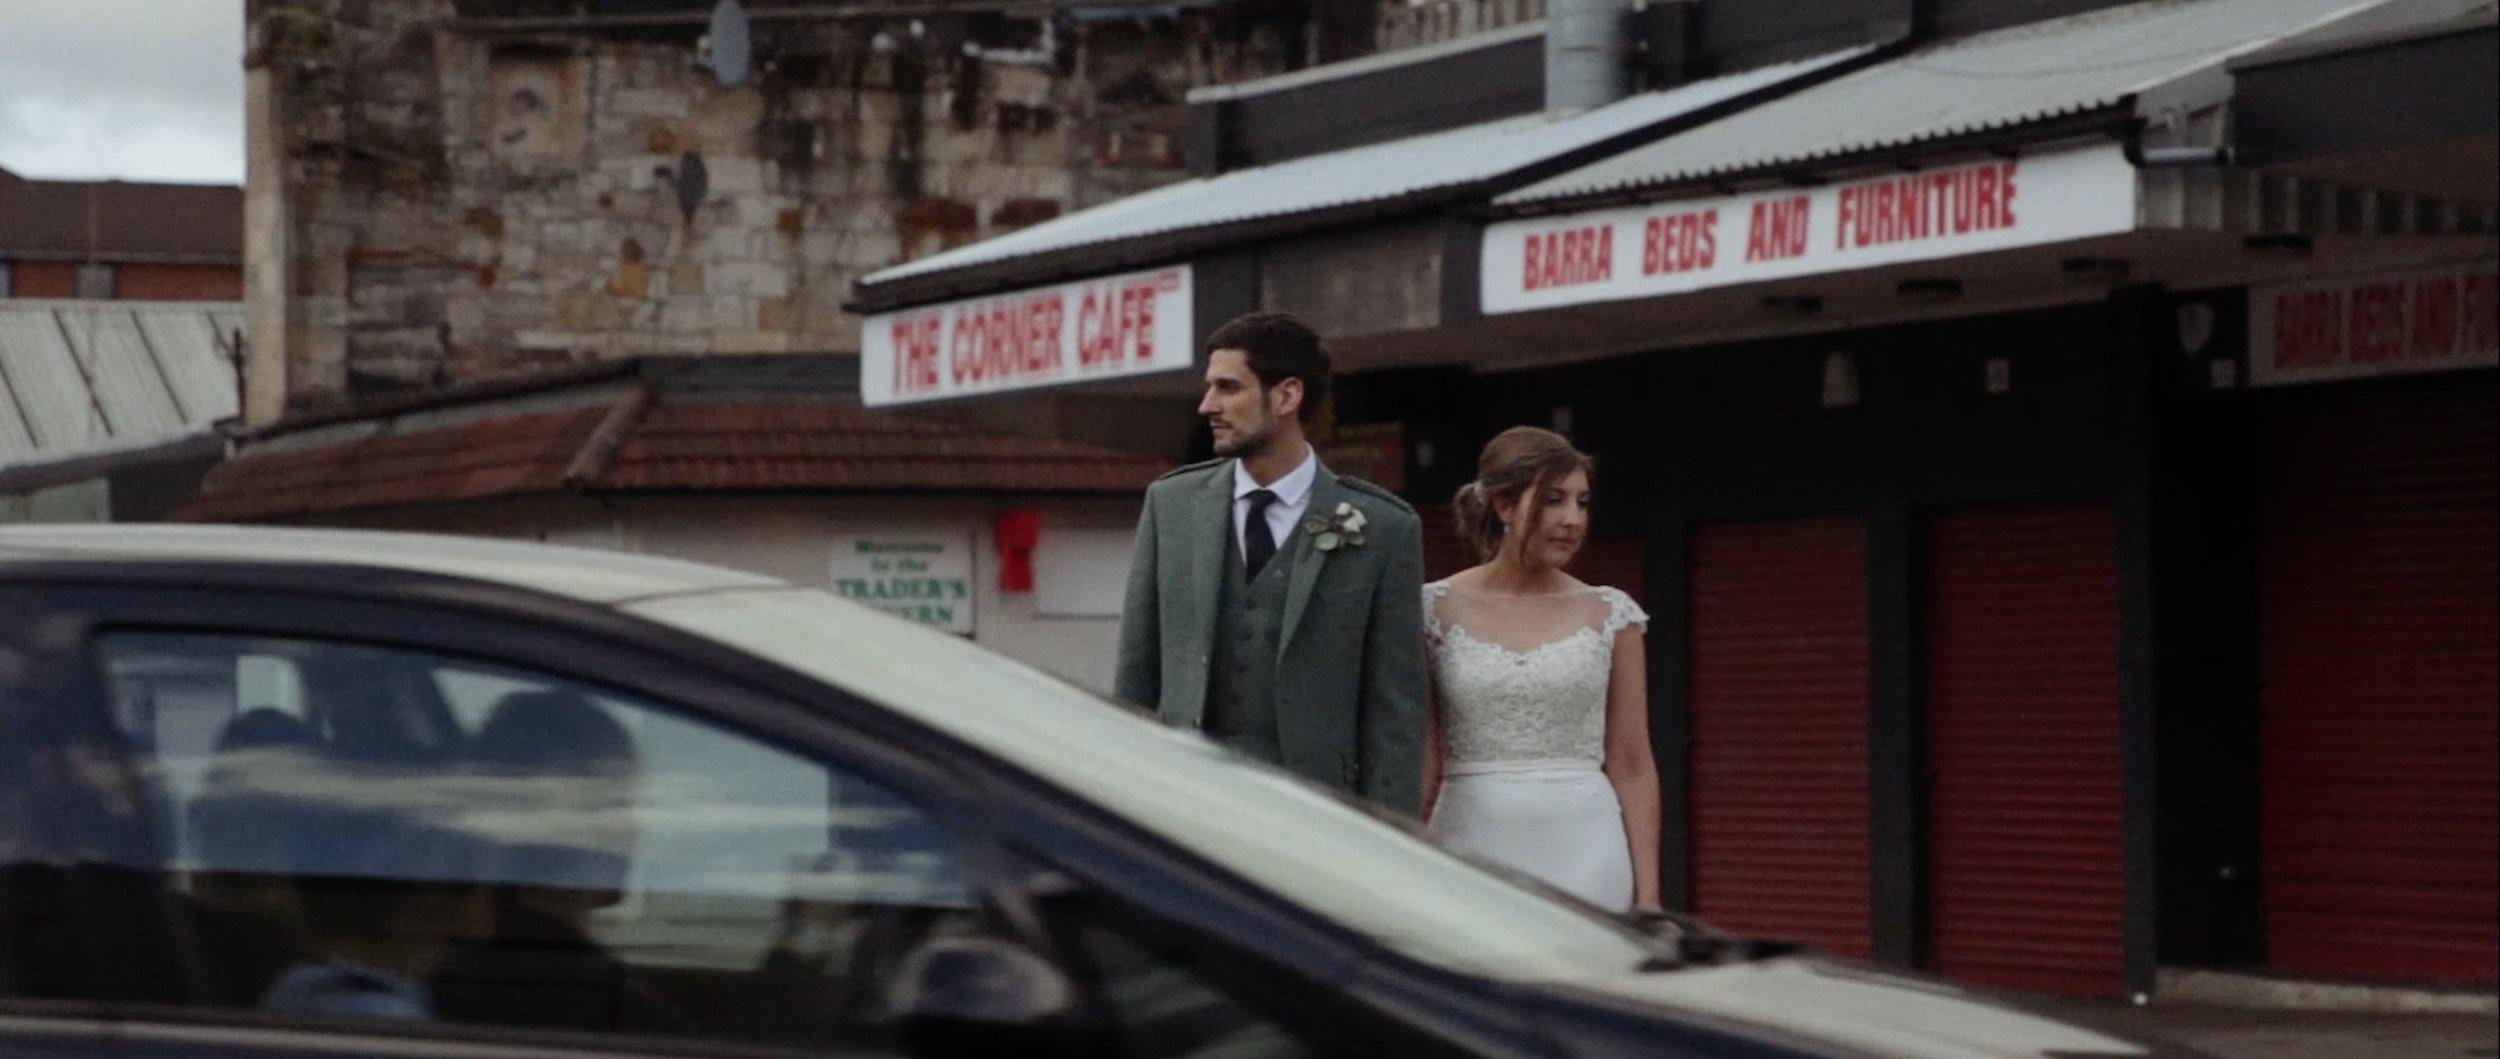 glencoe-wedding-videographer_LL_05.jpg